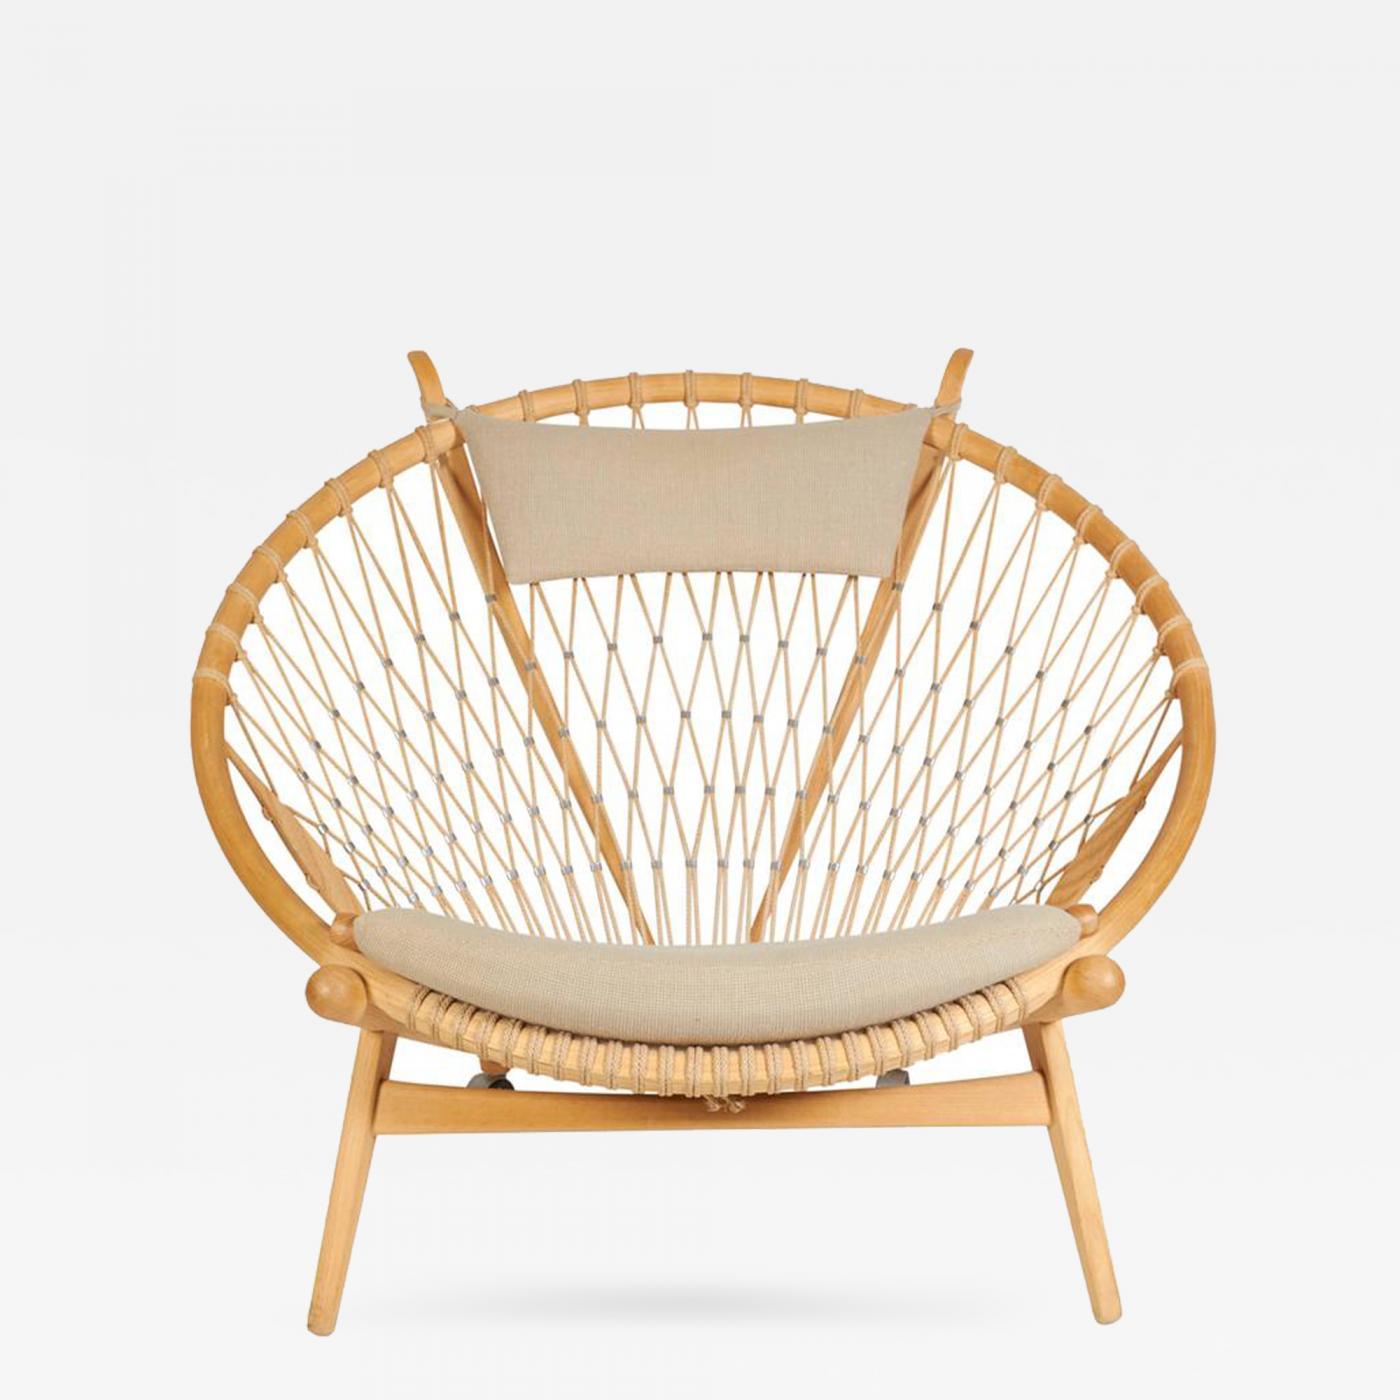 Hans Wegner Quot The Hoop Chair Quot By Hans J Wegner